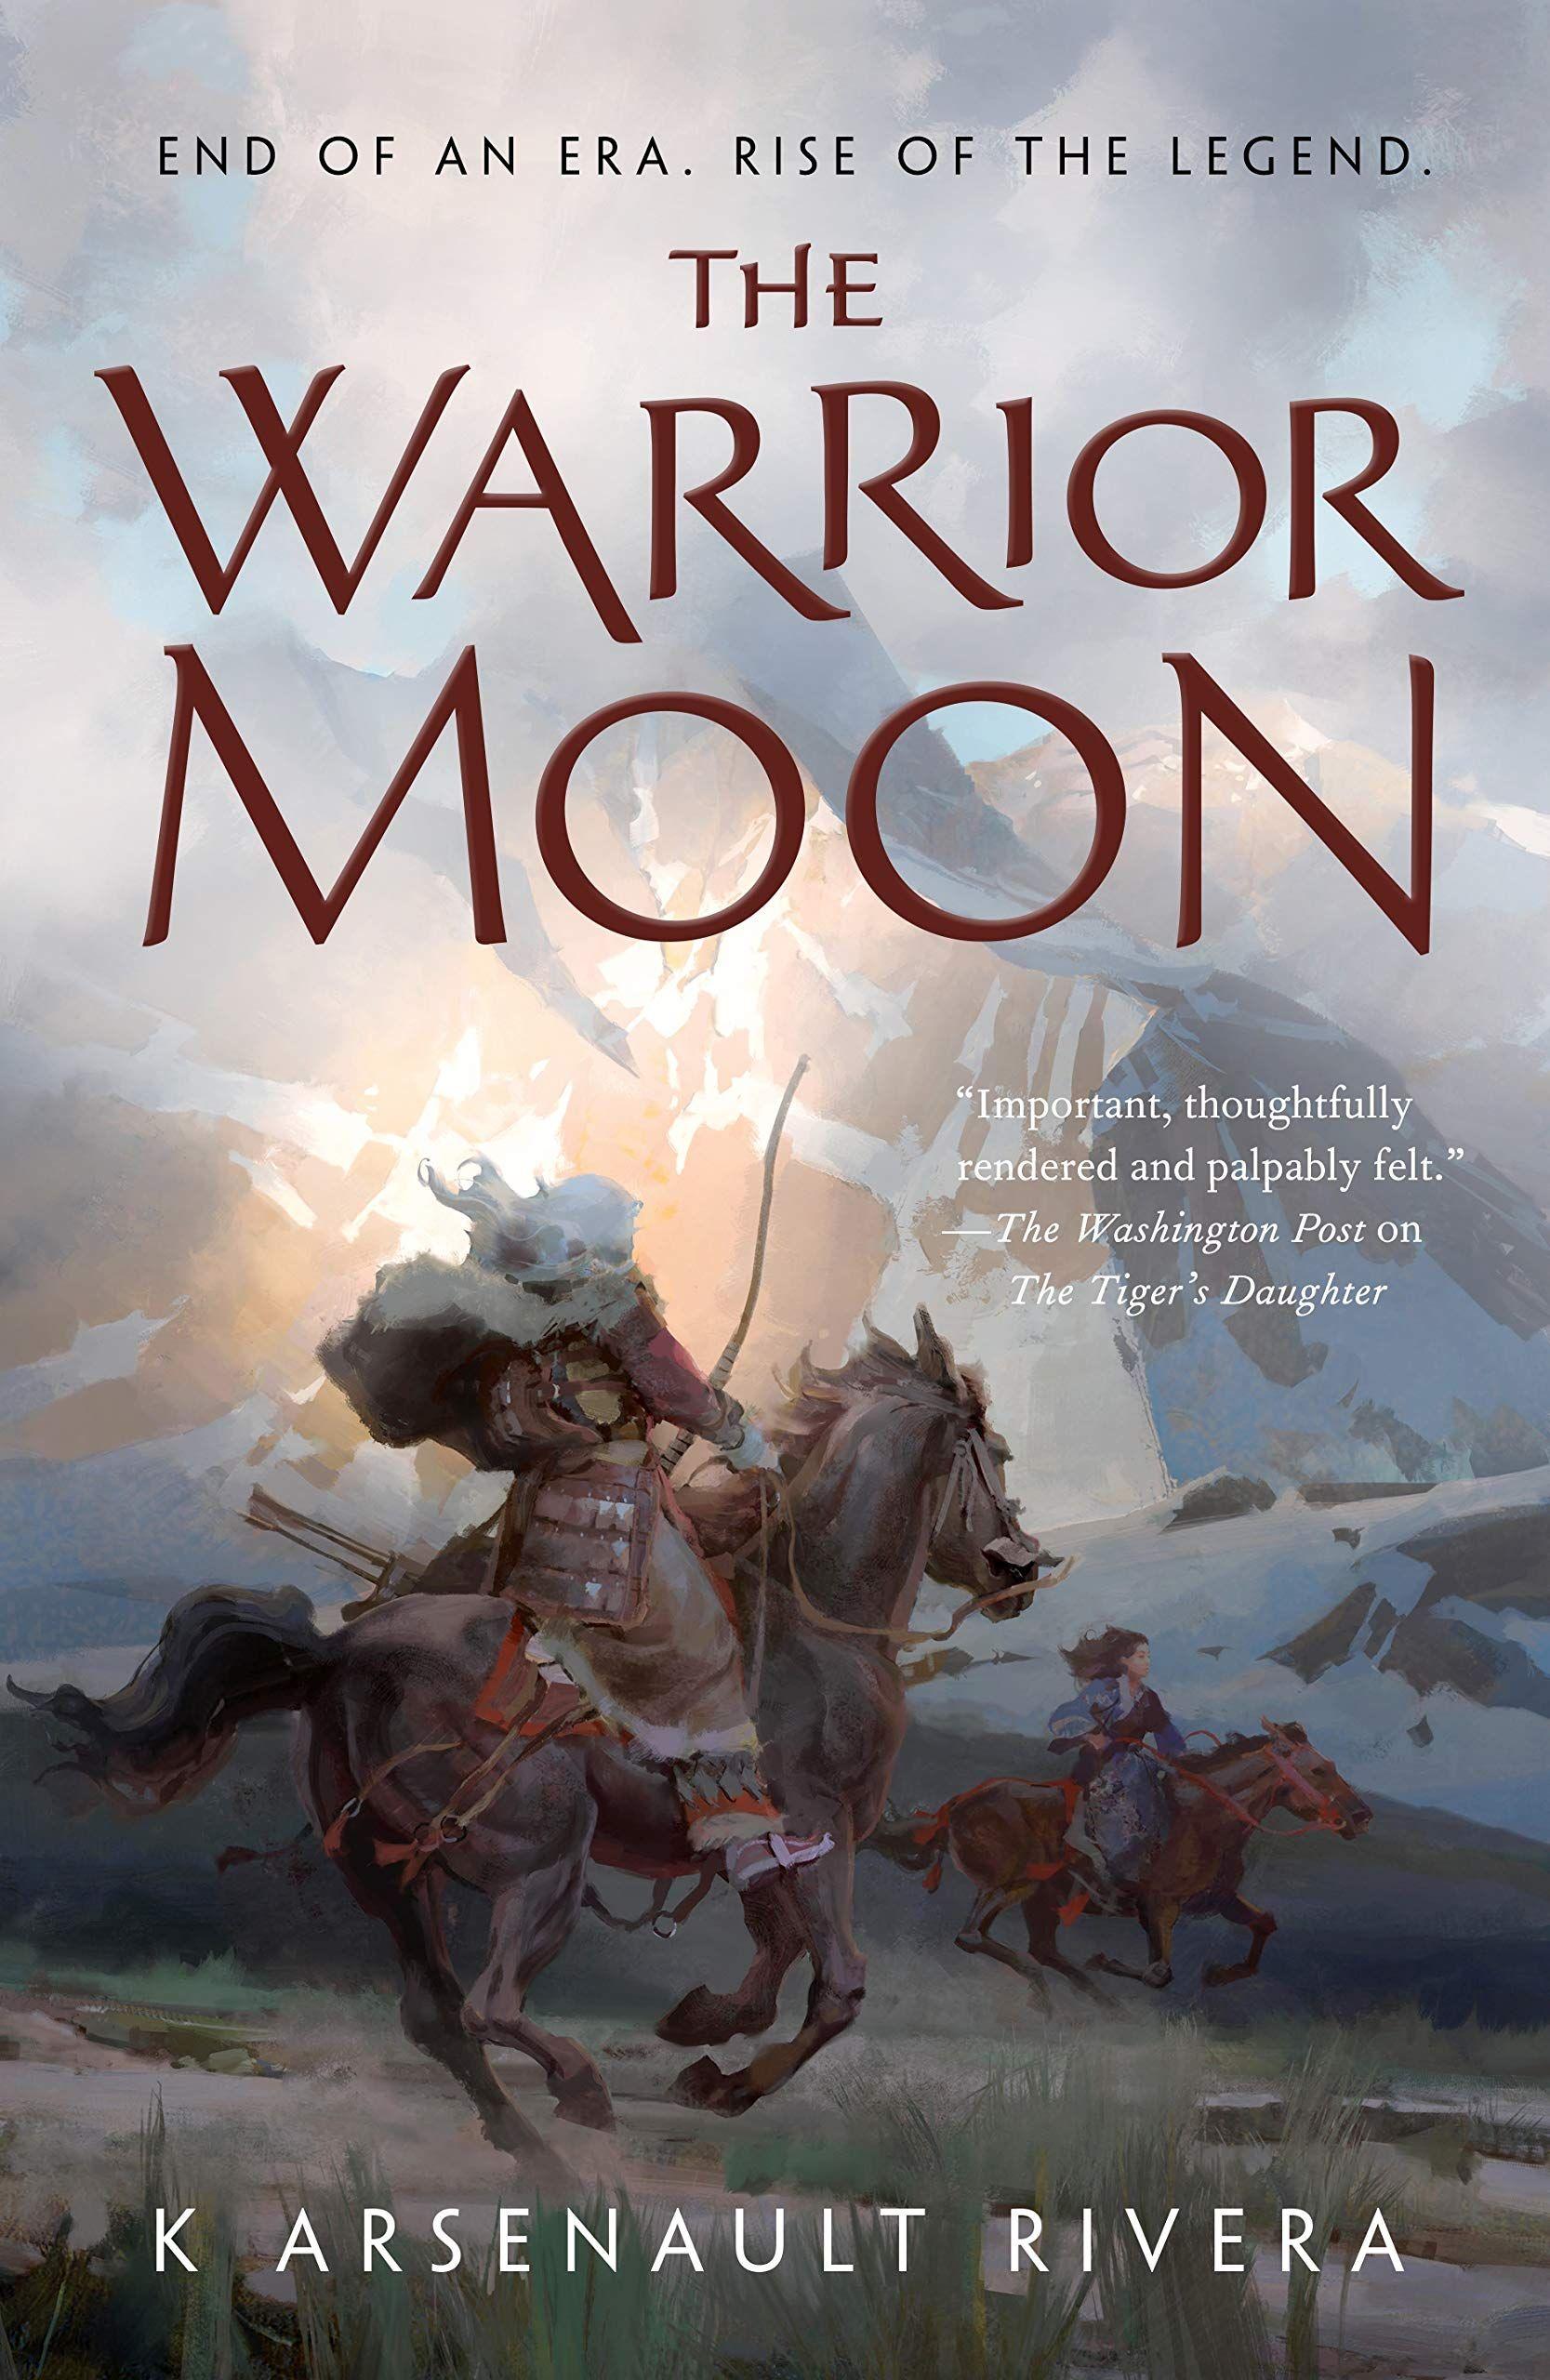 The Warrior Moon (Ascendant): K Arsenault Rivera